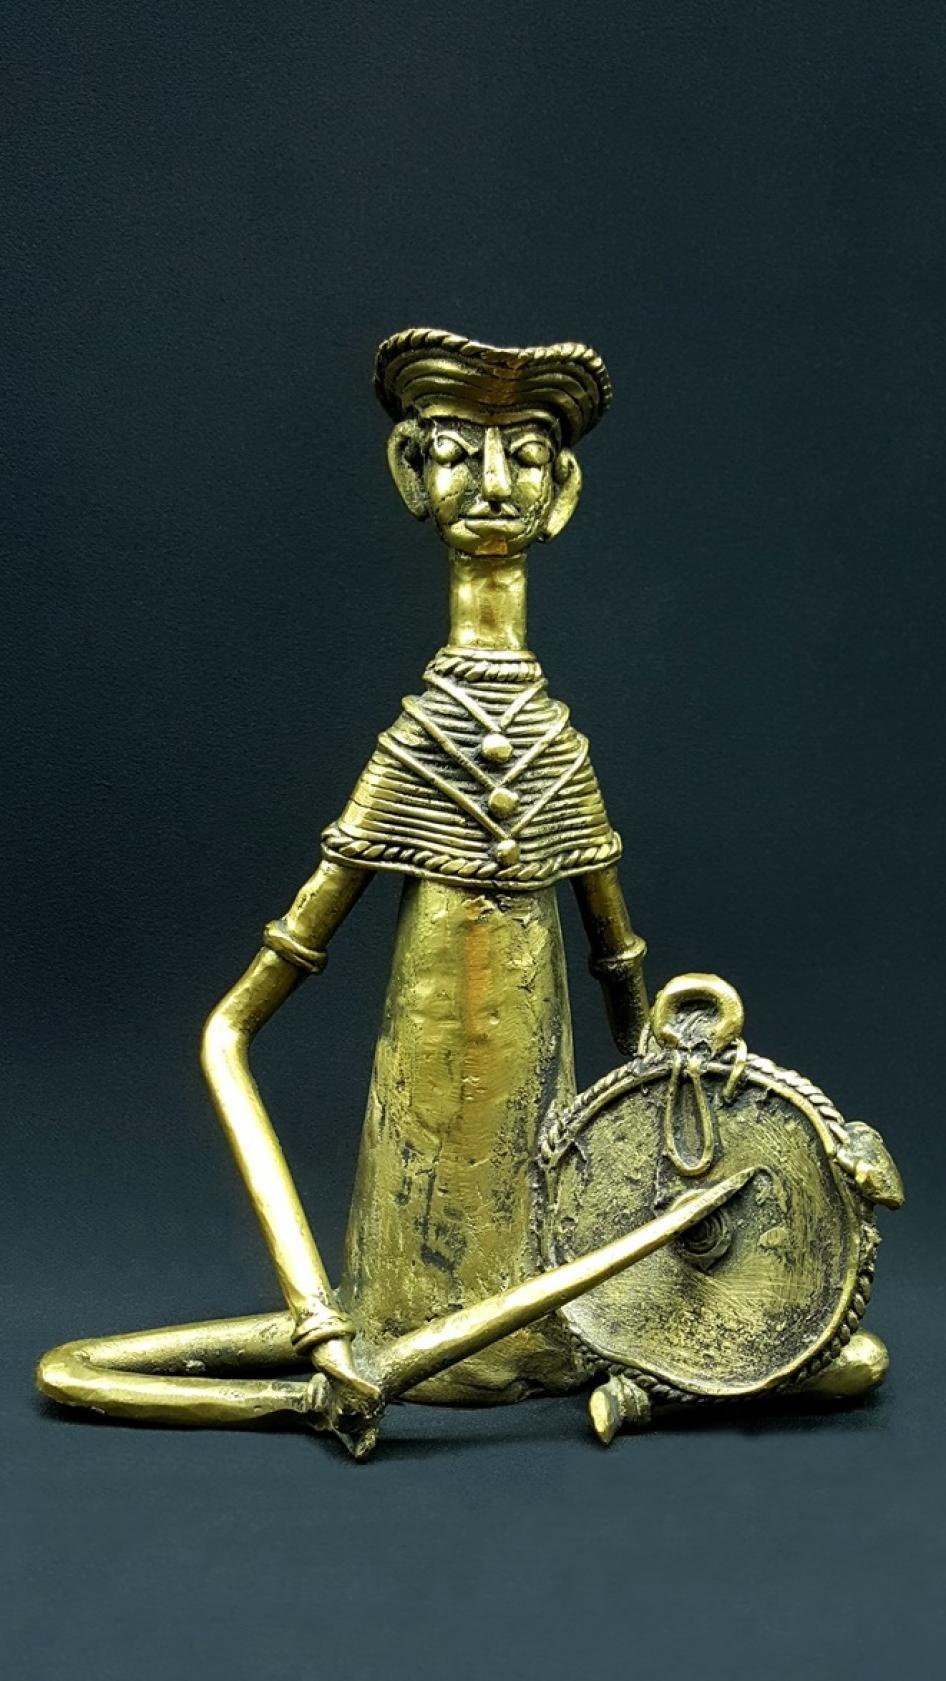 Statue Bastar Le musicien cymbale